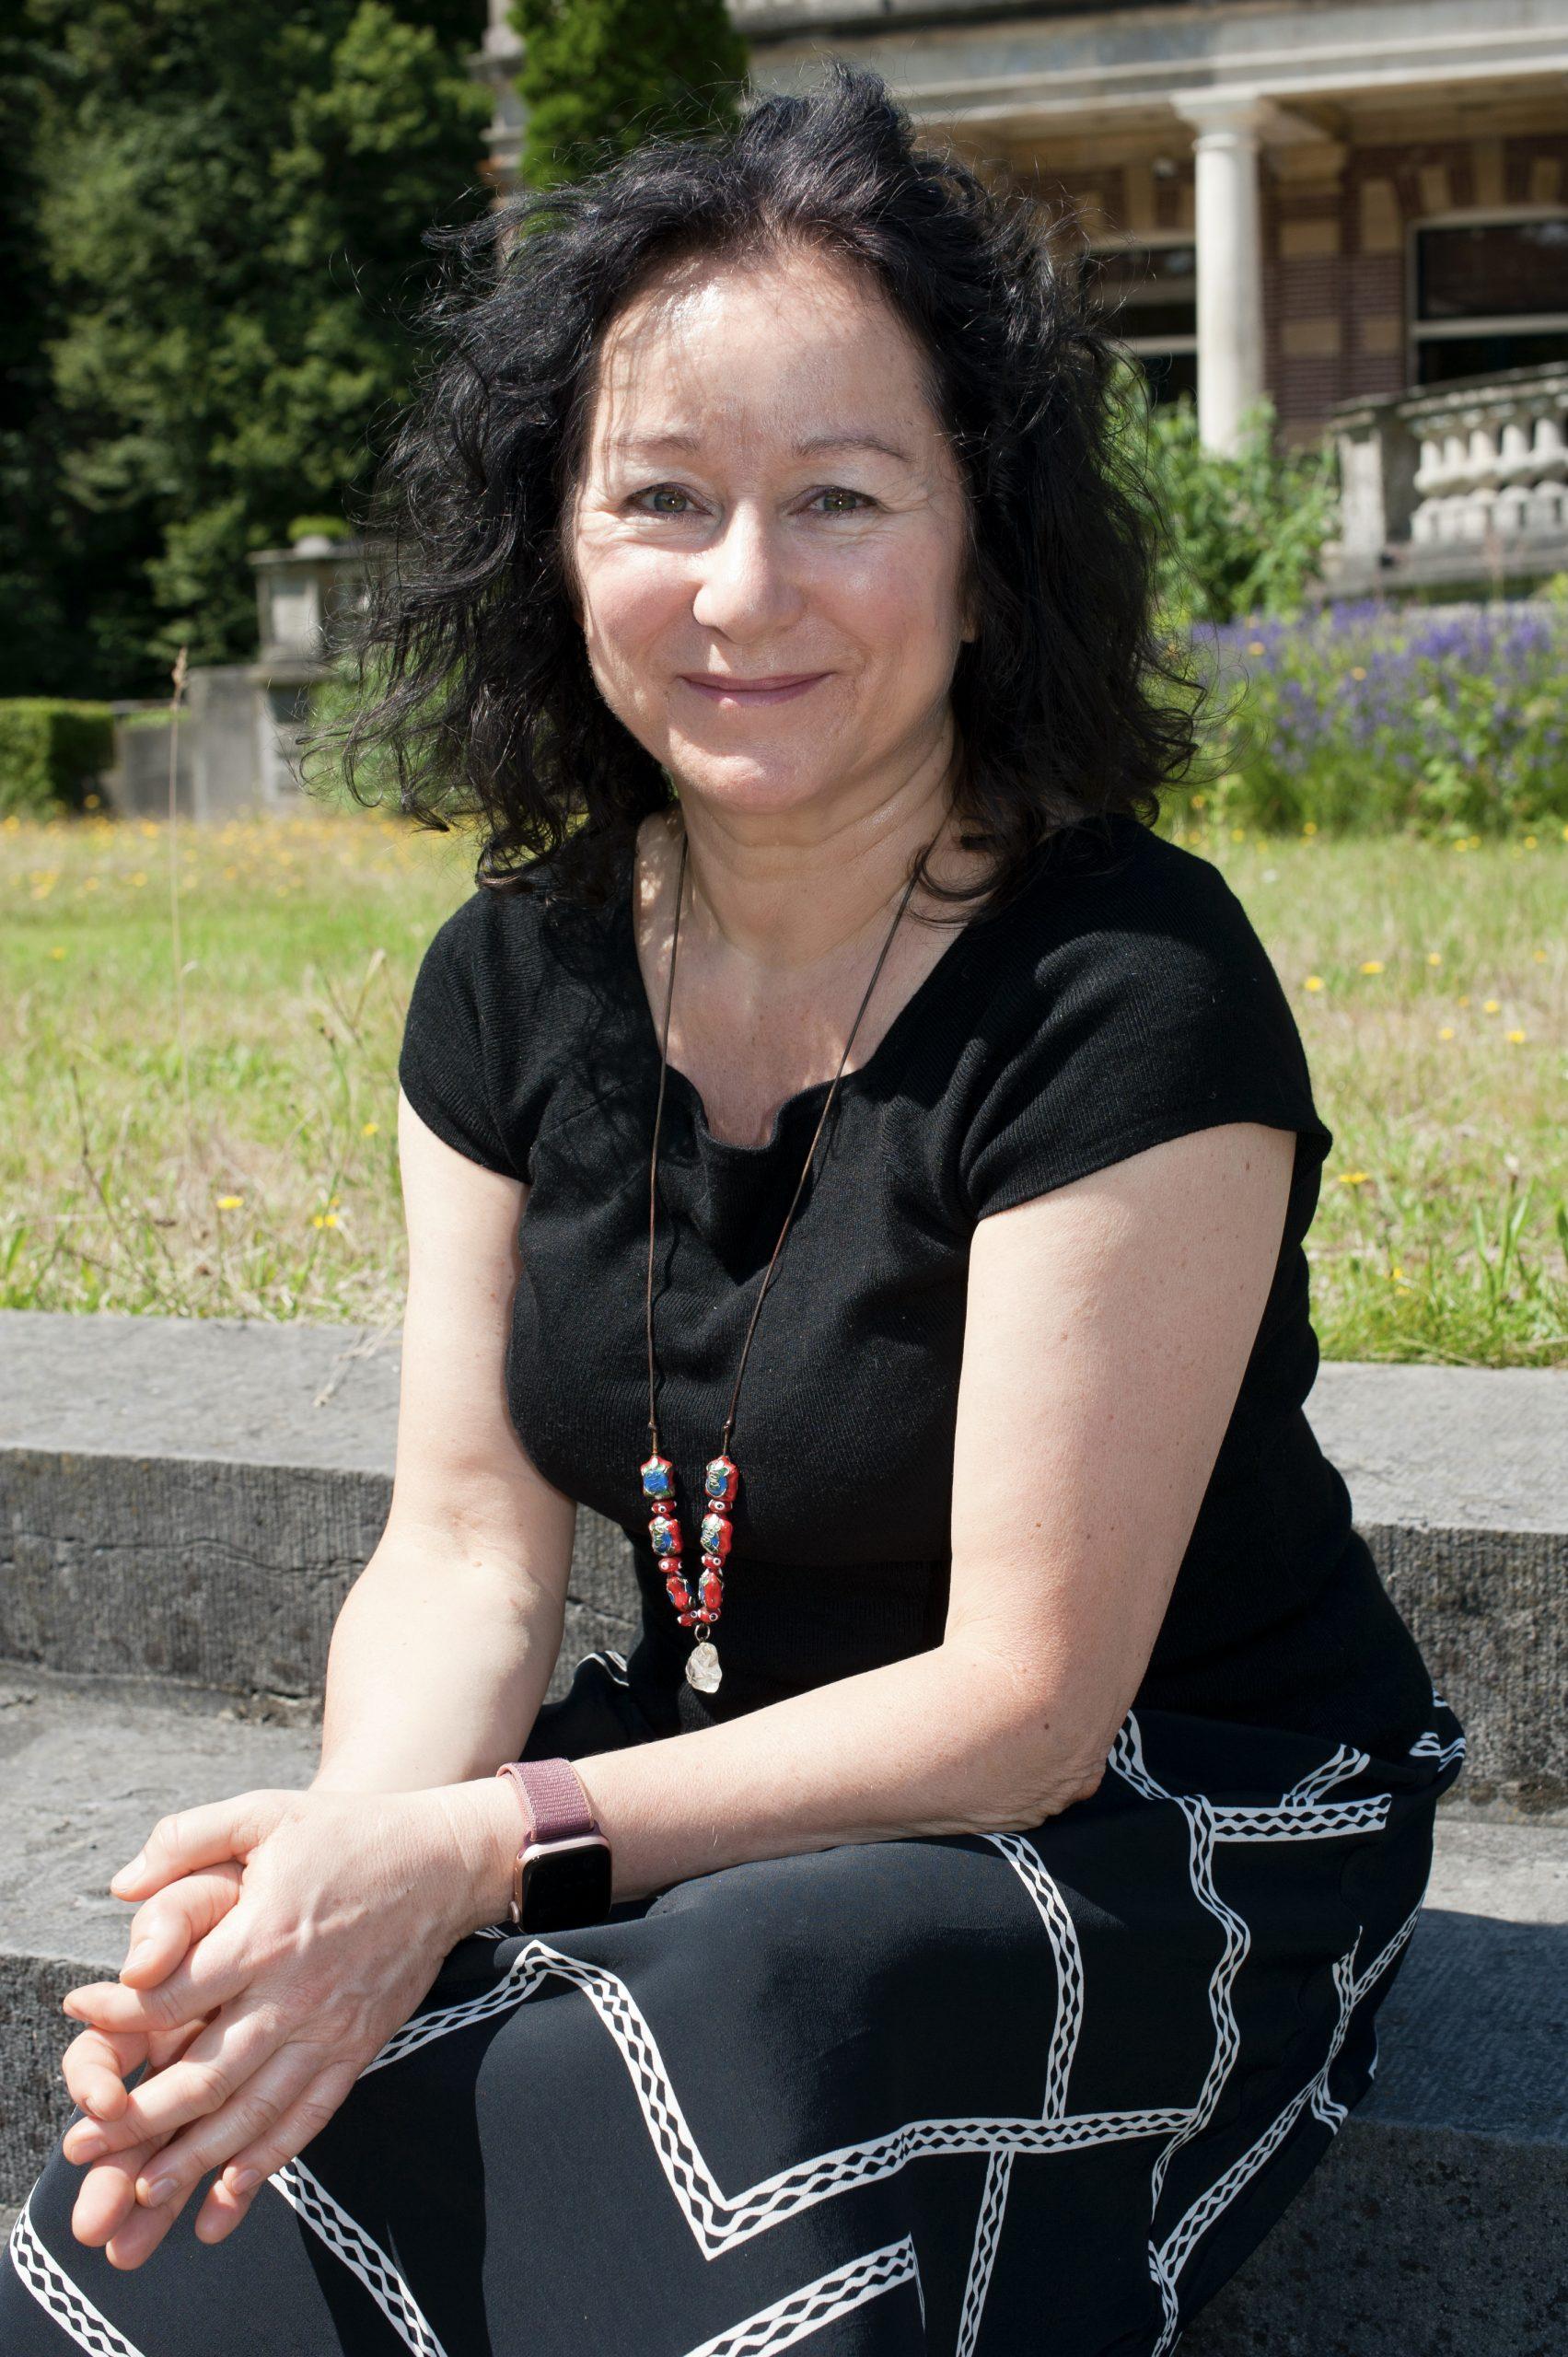 Inez Herrebrugh Psycholoog Nip Hypnotherapeut Haarlem